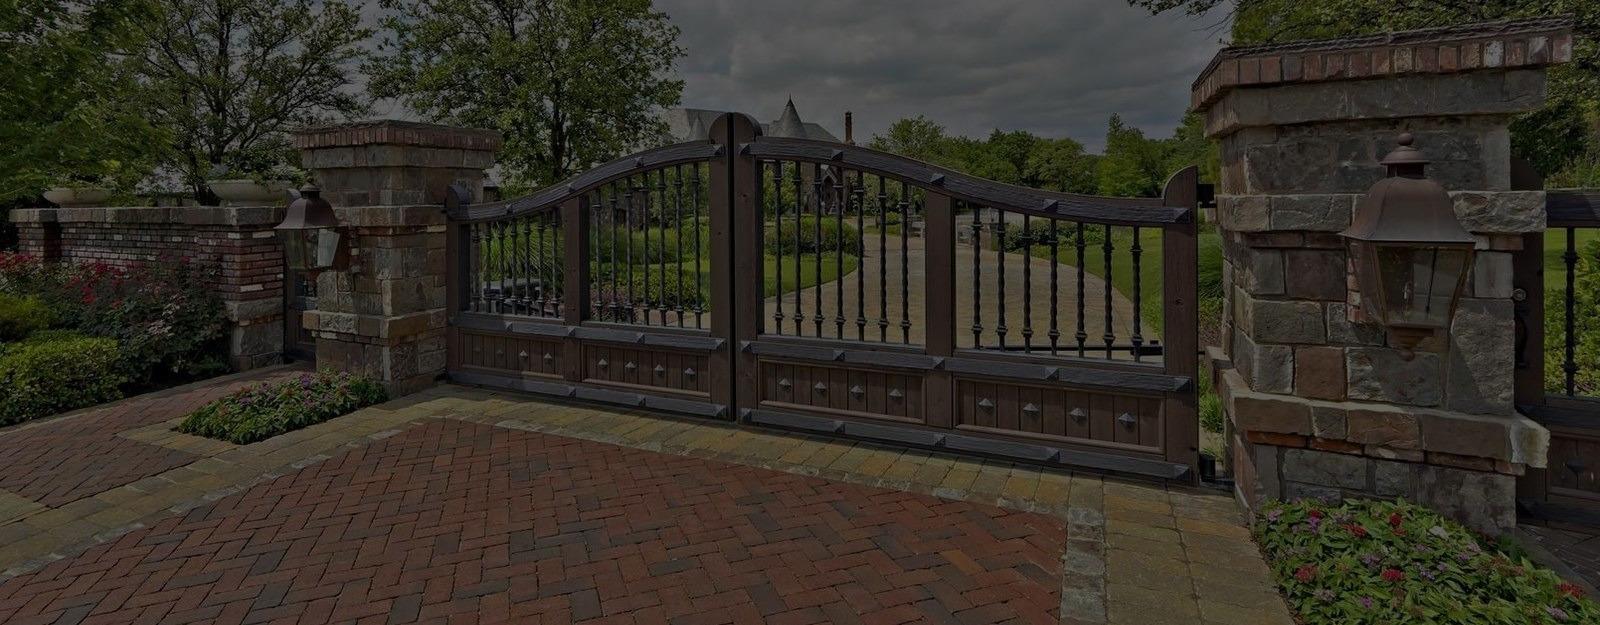 Automatic Gate Repair Murray